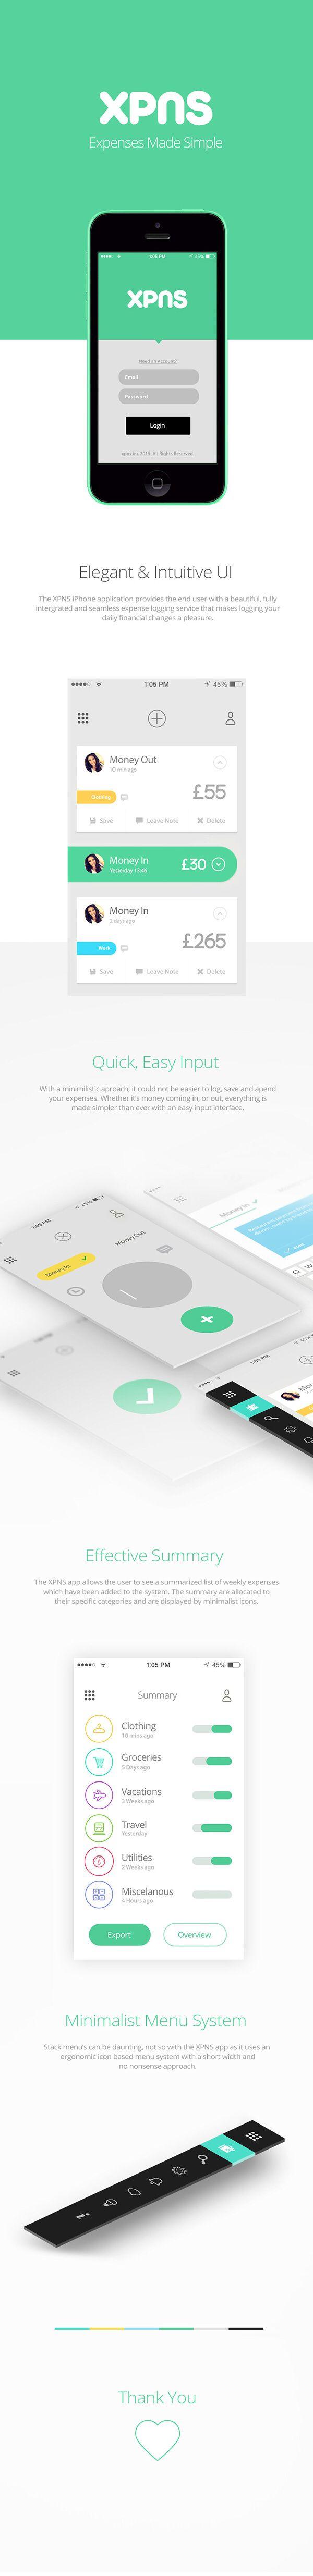 XPnS (Expenses app concept)